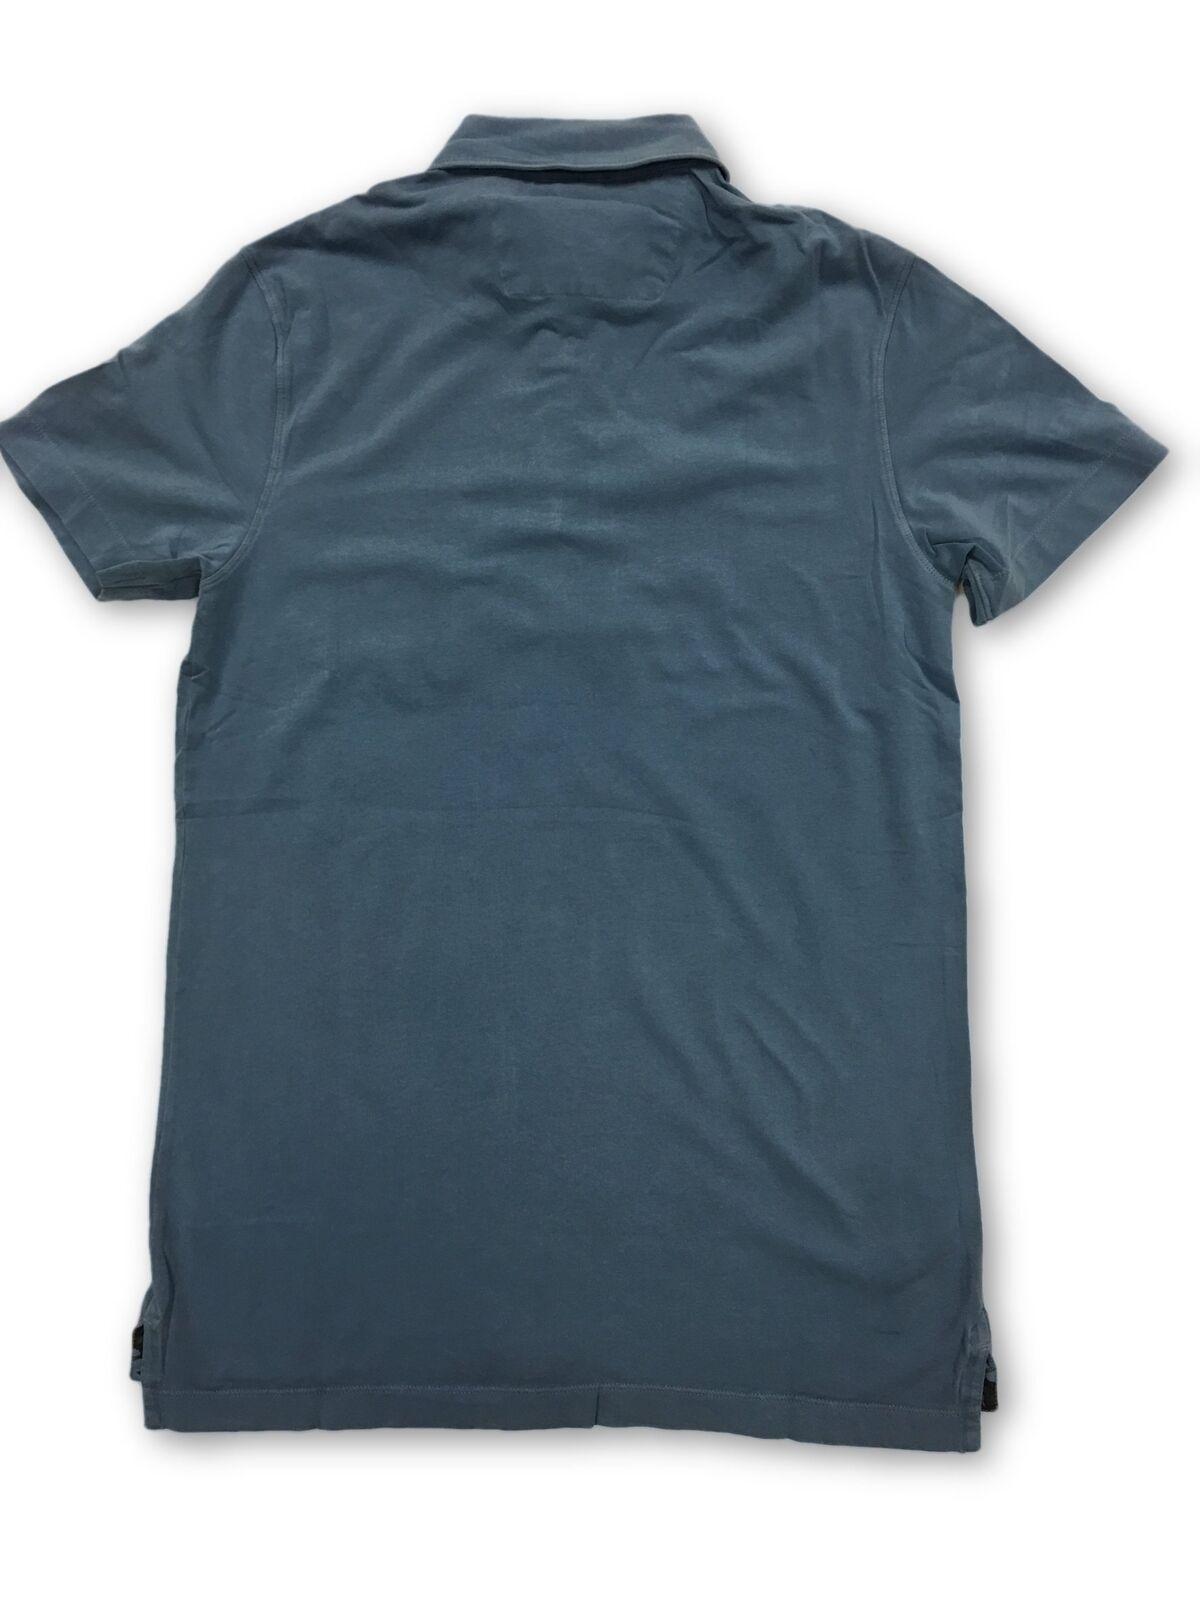 Tailor Vintage polo shirt in denim blue